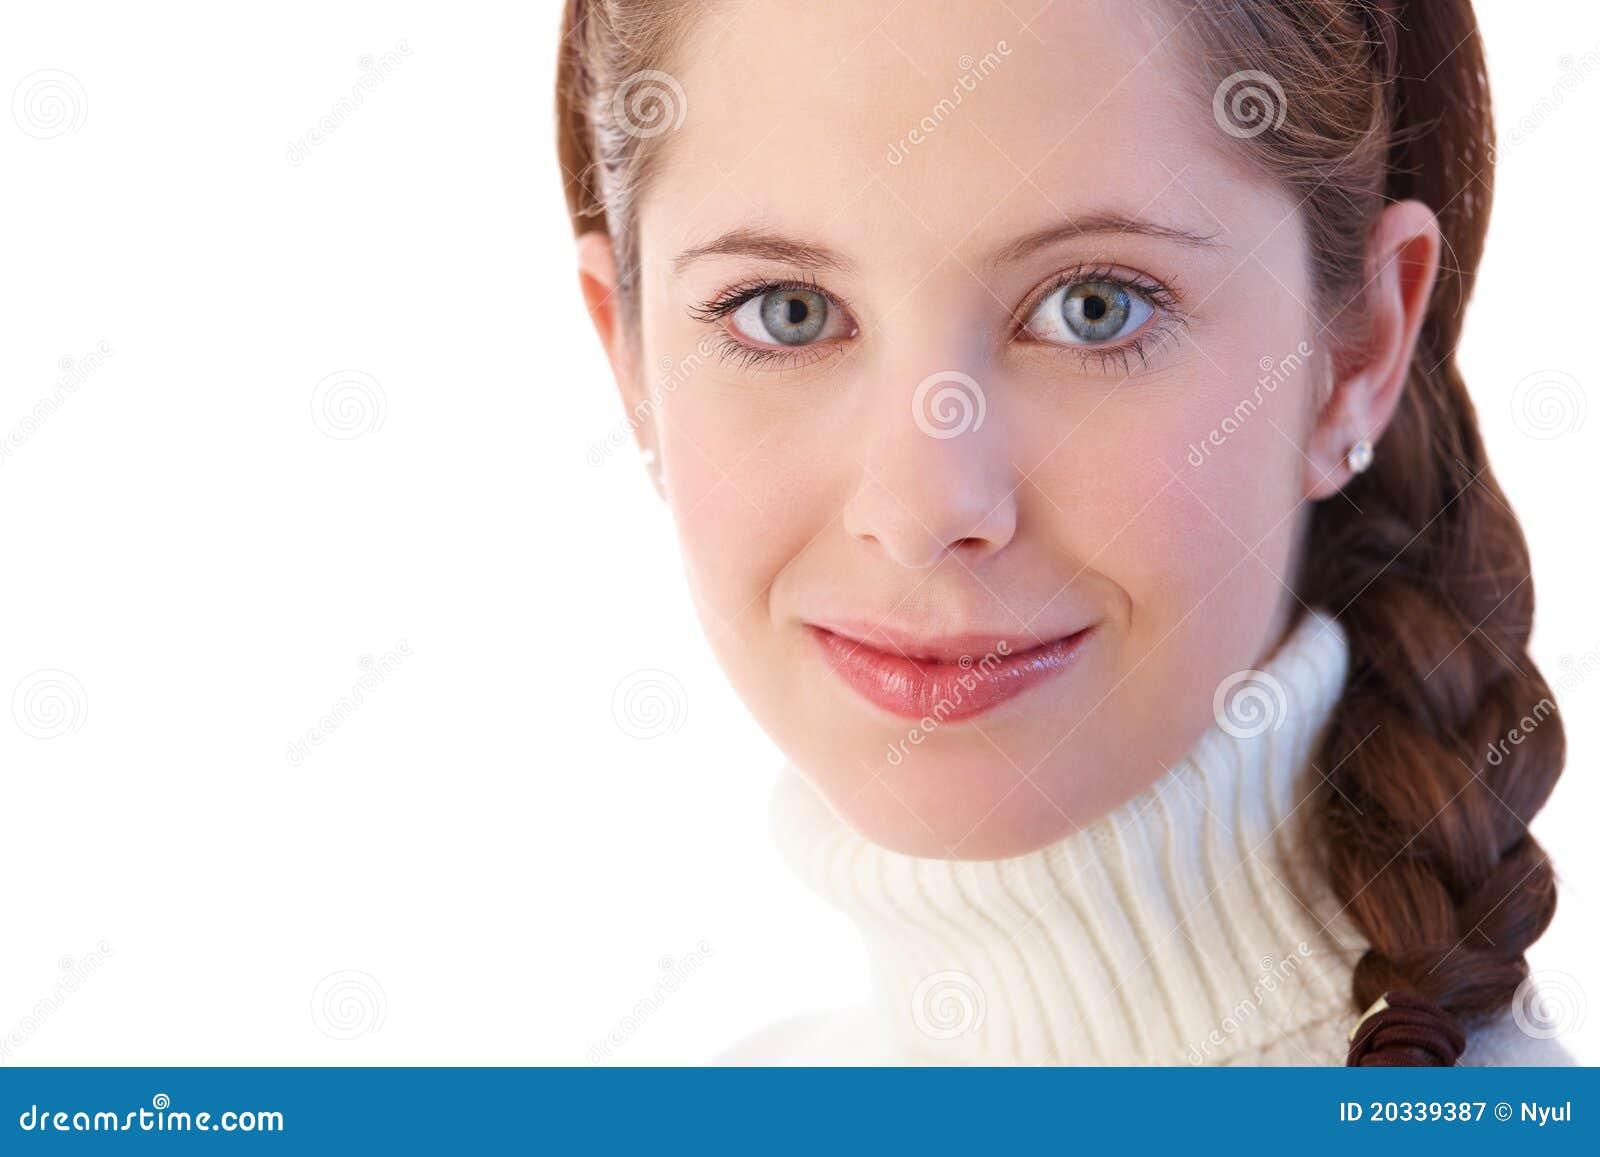 rachel ray facial hair show